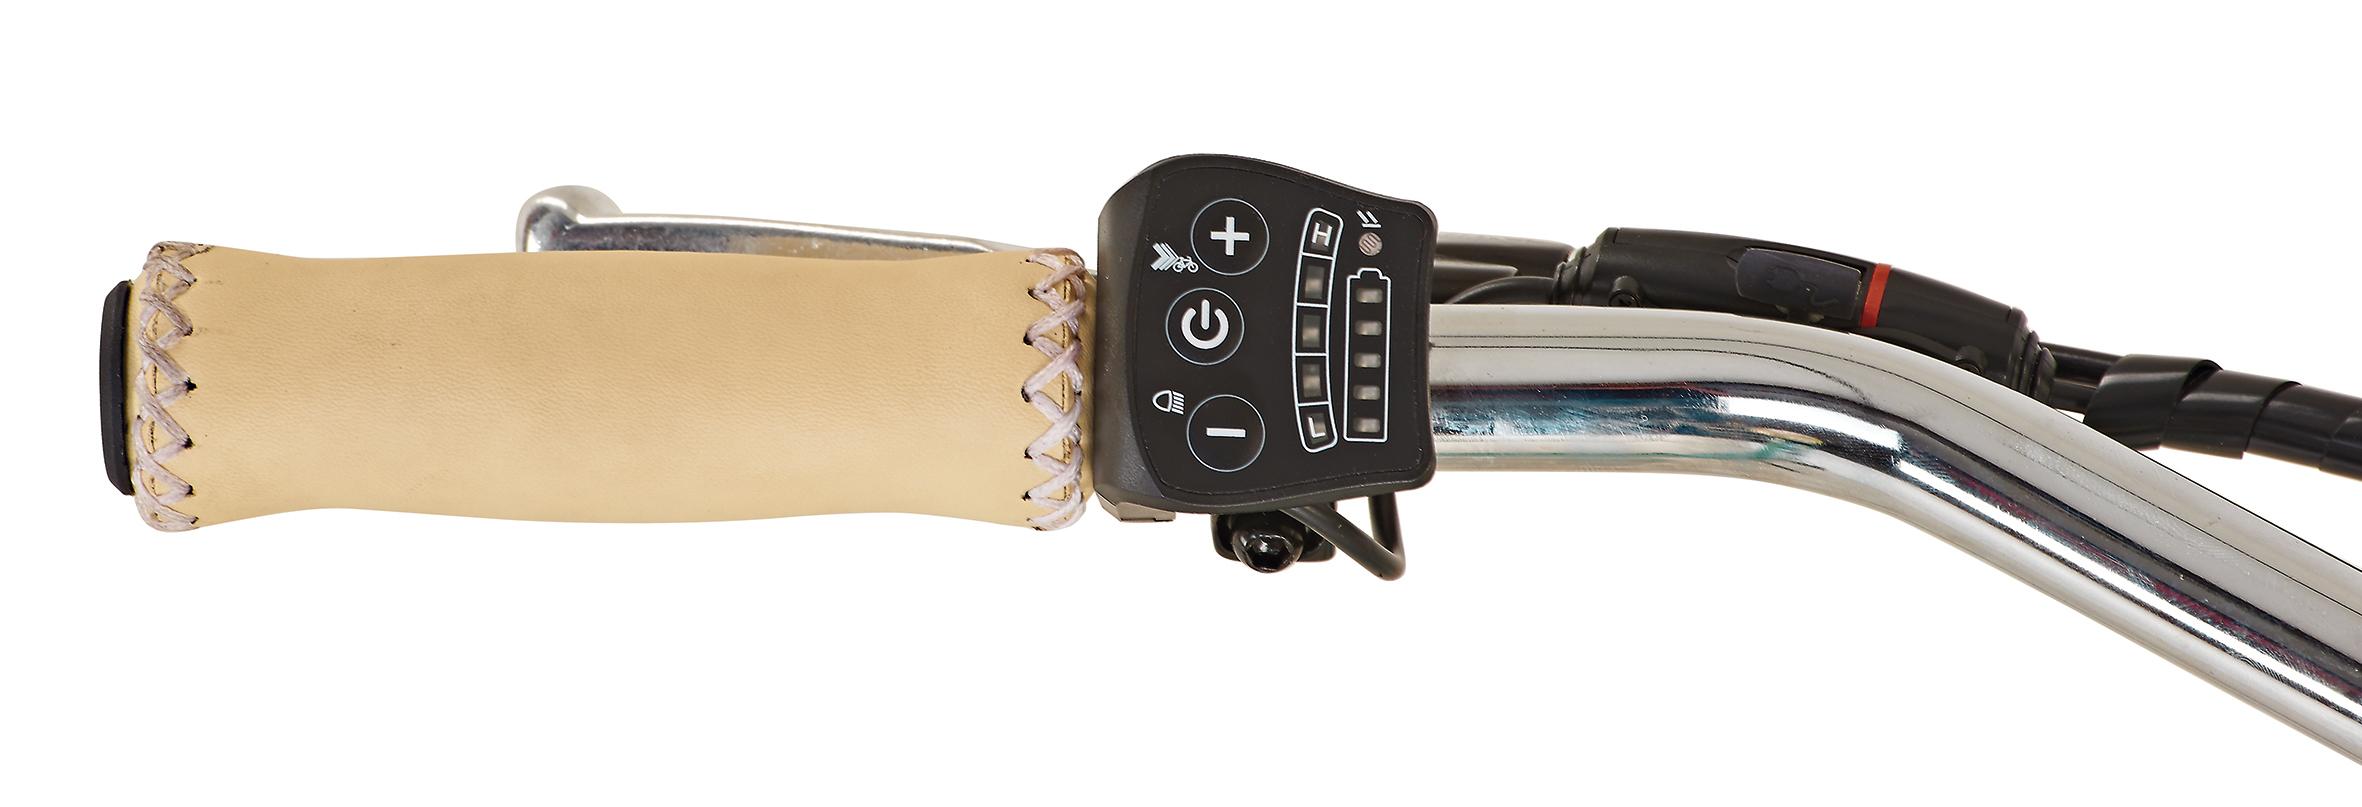 "Prophete Elektrofahrrad / E-Bike Geniesser e9.1 City E-Bike 28"" polar Bild 3"